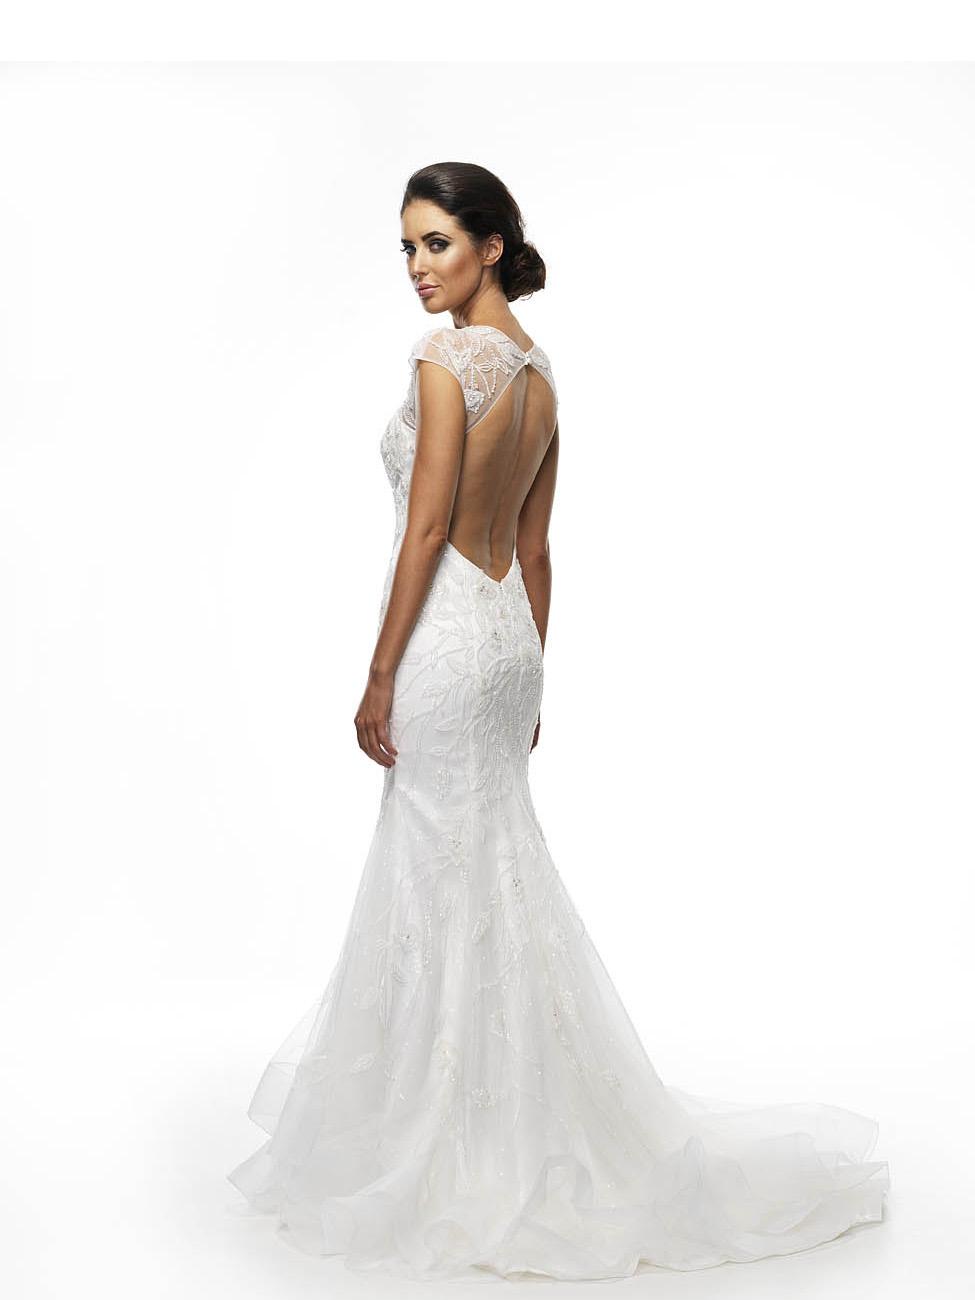 Buy wedding dresses in melbourne wedding dress shop for Wedding dresses under 3000 melbourne